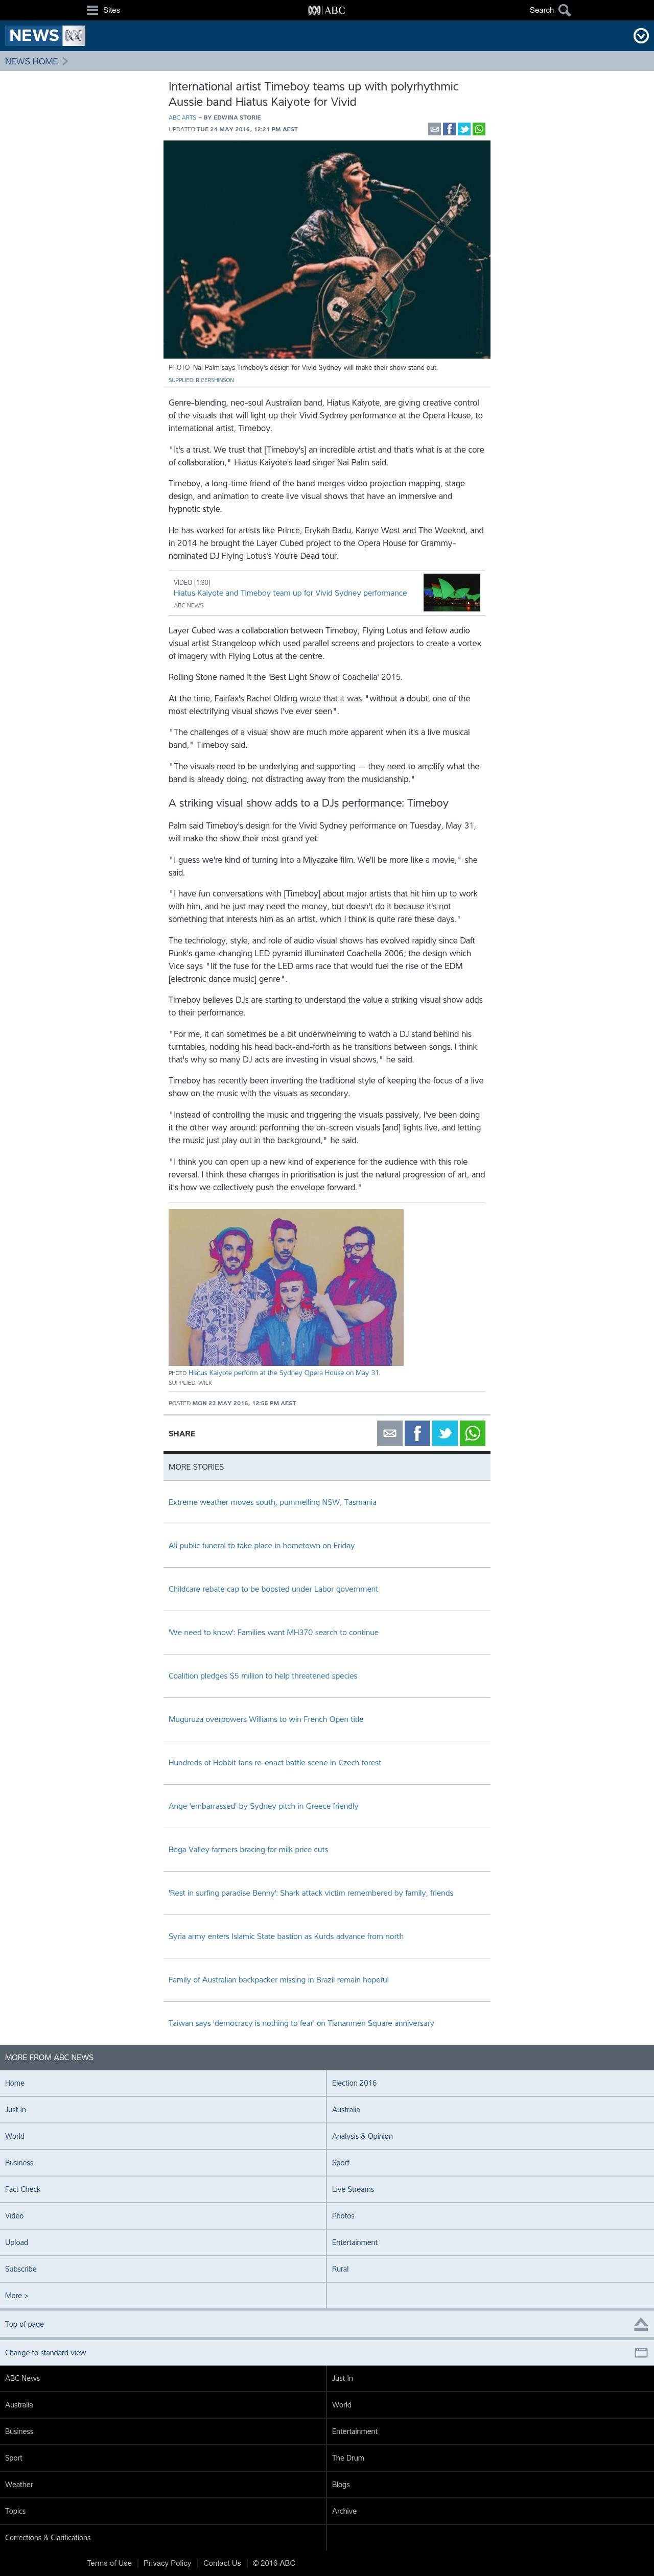 International artist Timeboy teams up with polyrhythmic Aussie band Hiatus Kaiyote for Vivid